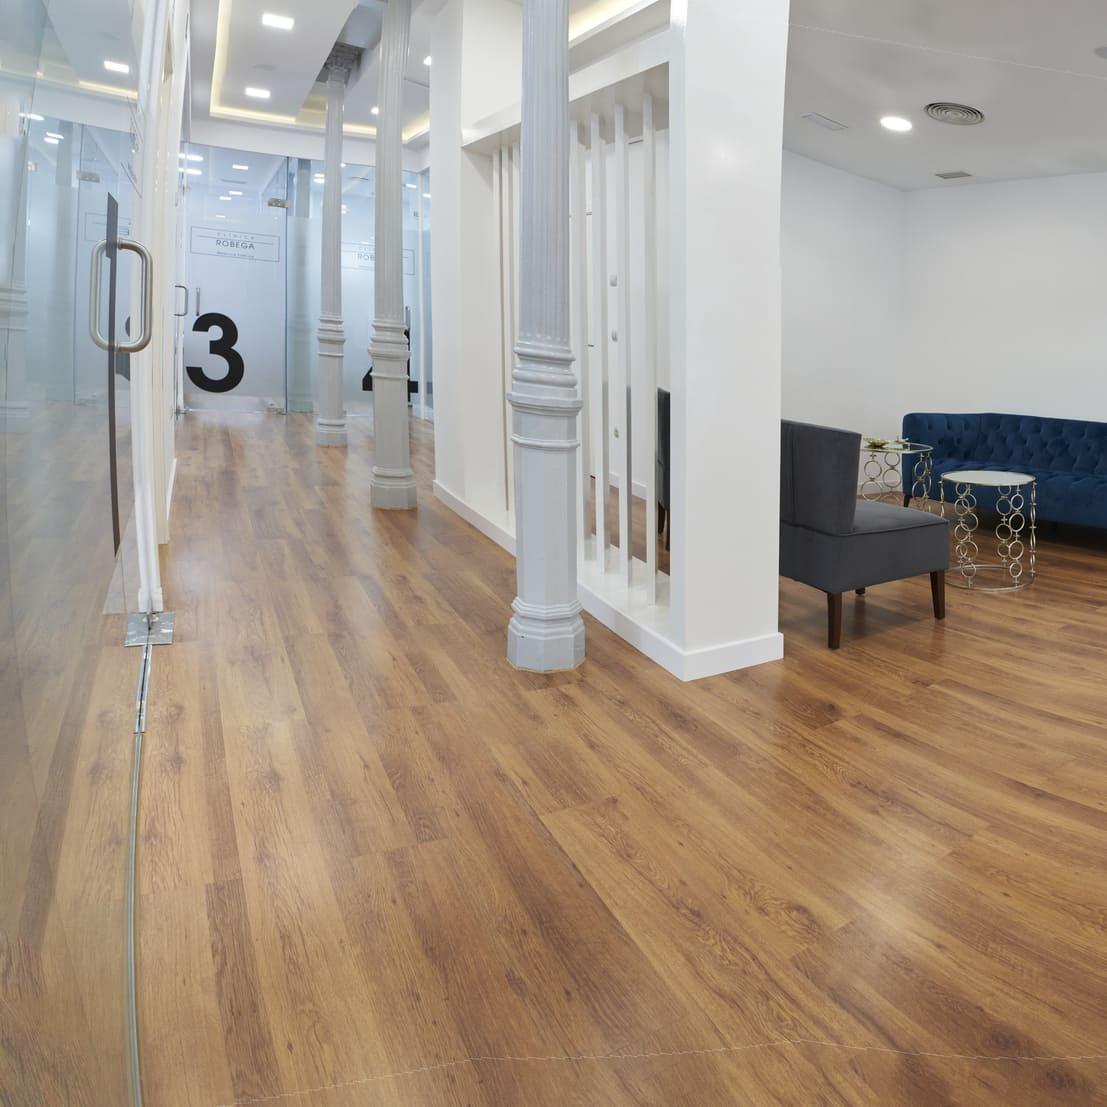 clinica robega interior 1